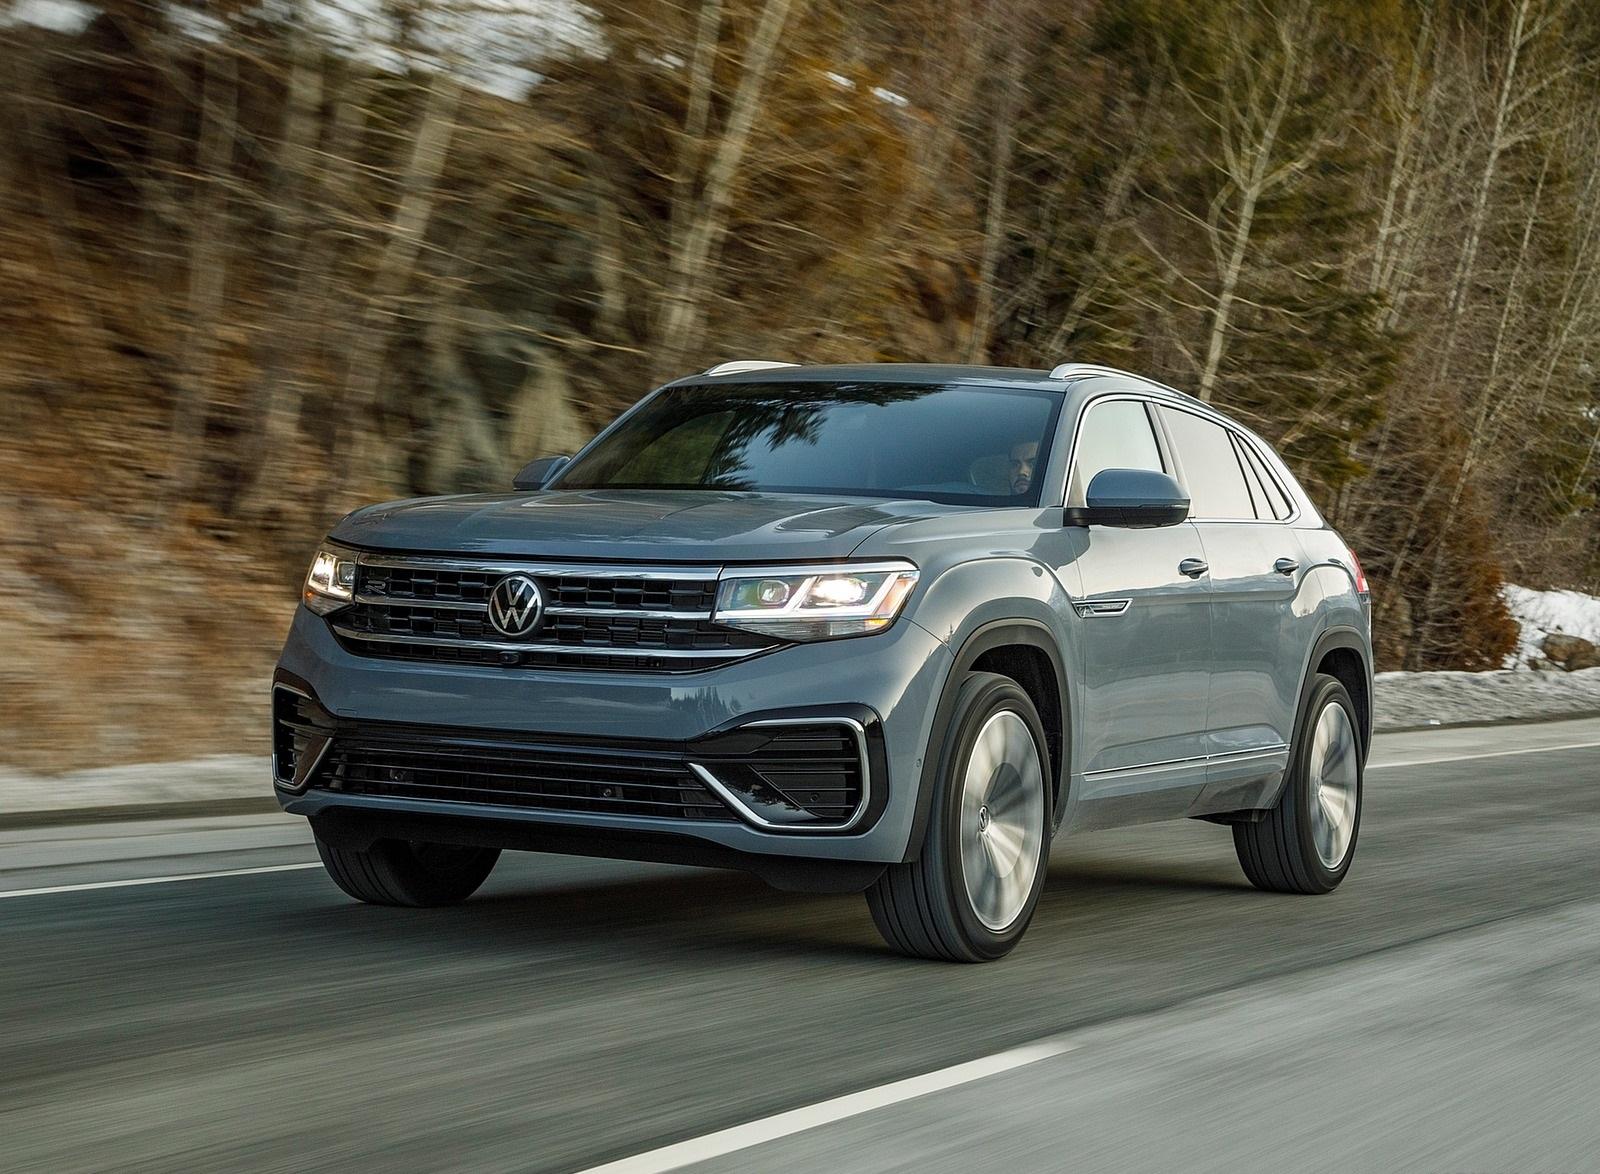 2020 Volkswagen Atlas Cross Sport SEL Premium R Line (Color: Pure Gray) Front Three-Quarter Wallpapers (5)